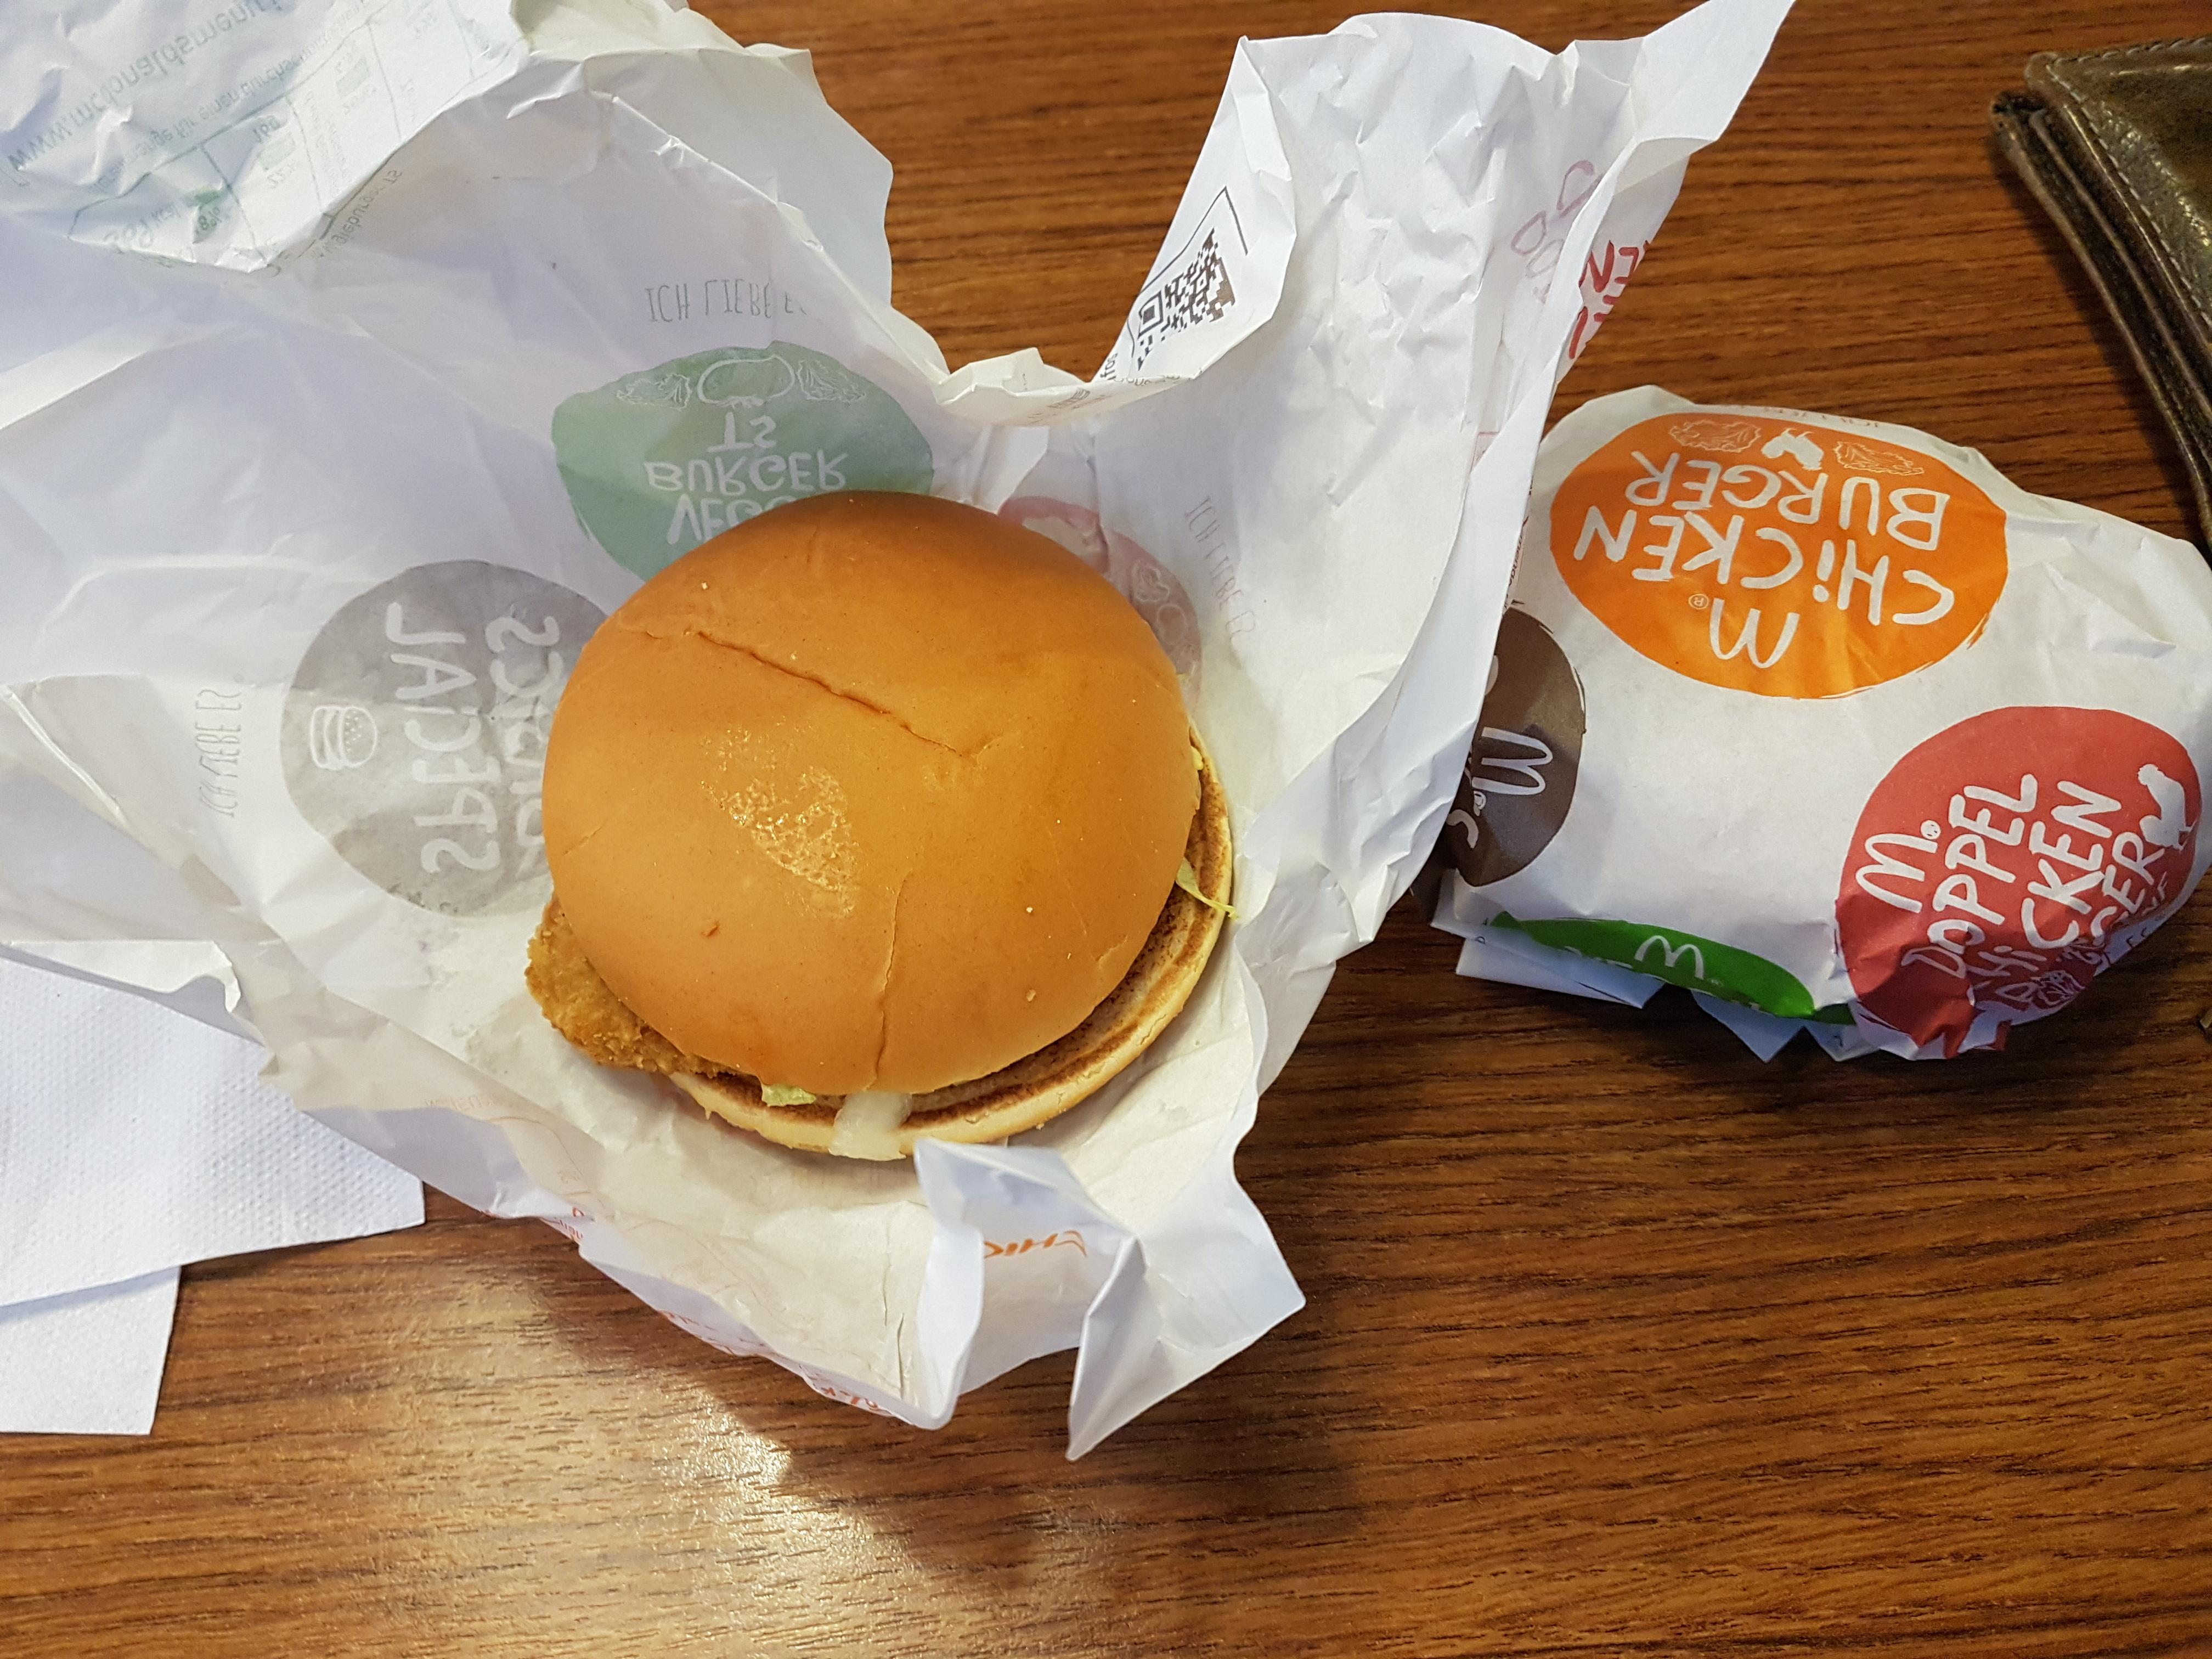 http://foodloader.net/Holz_2017-05-31_Chickenburger.jpg